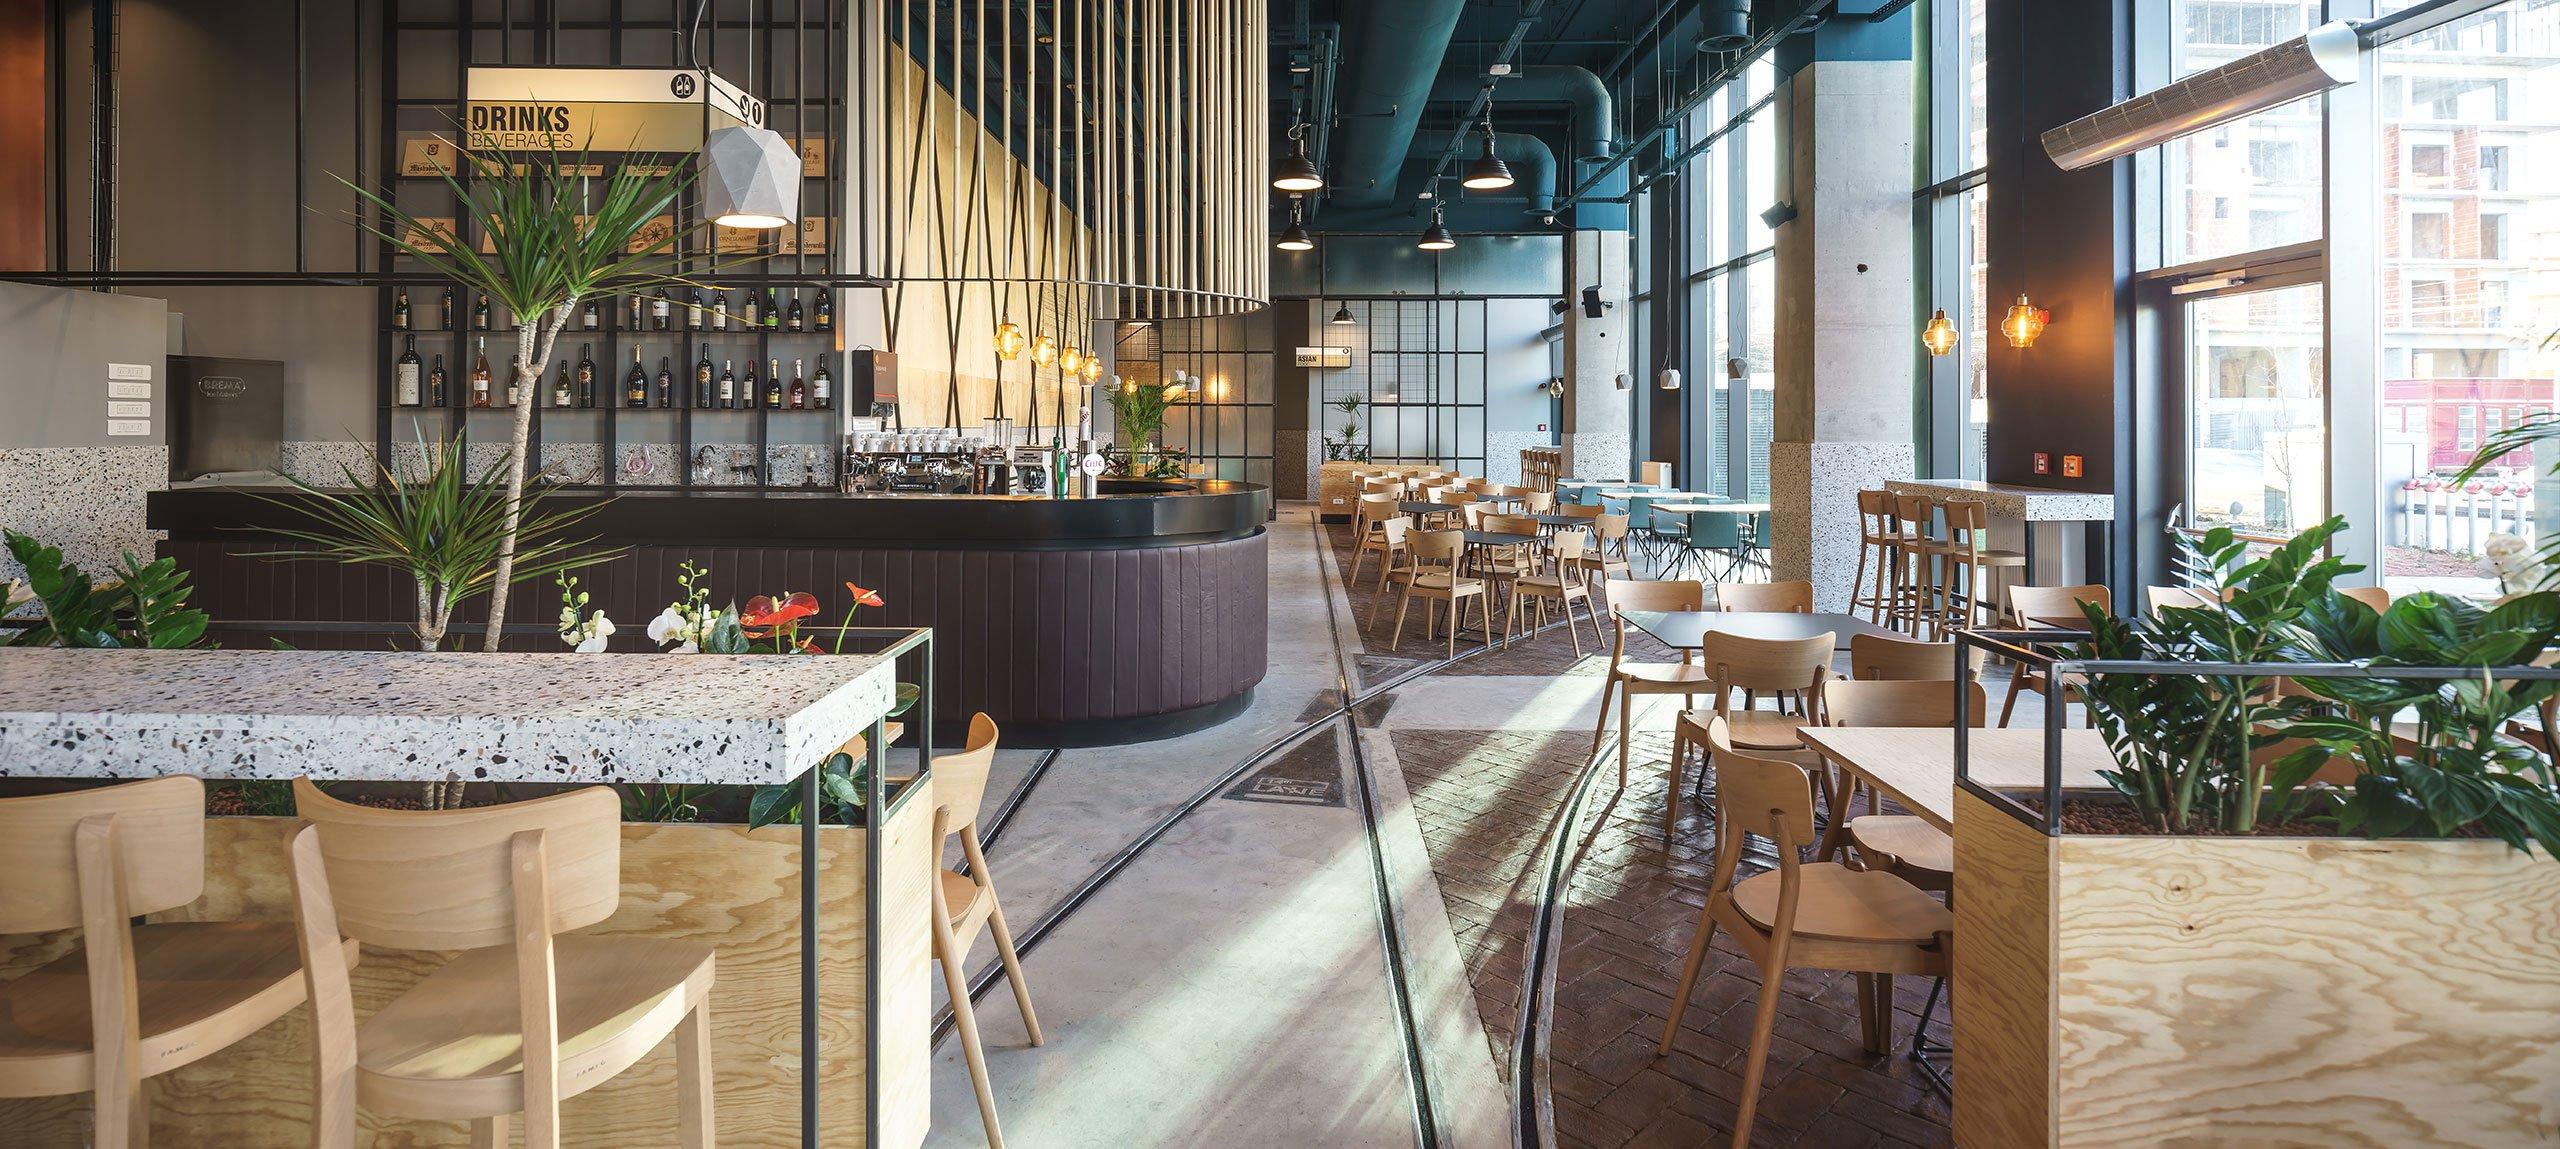 p2_14thlane_restaurant_bucharest_romania_yellow_office_yatzer